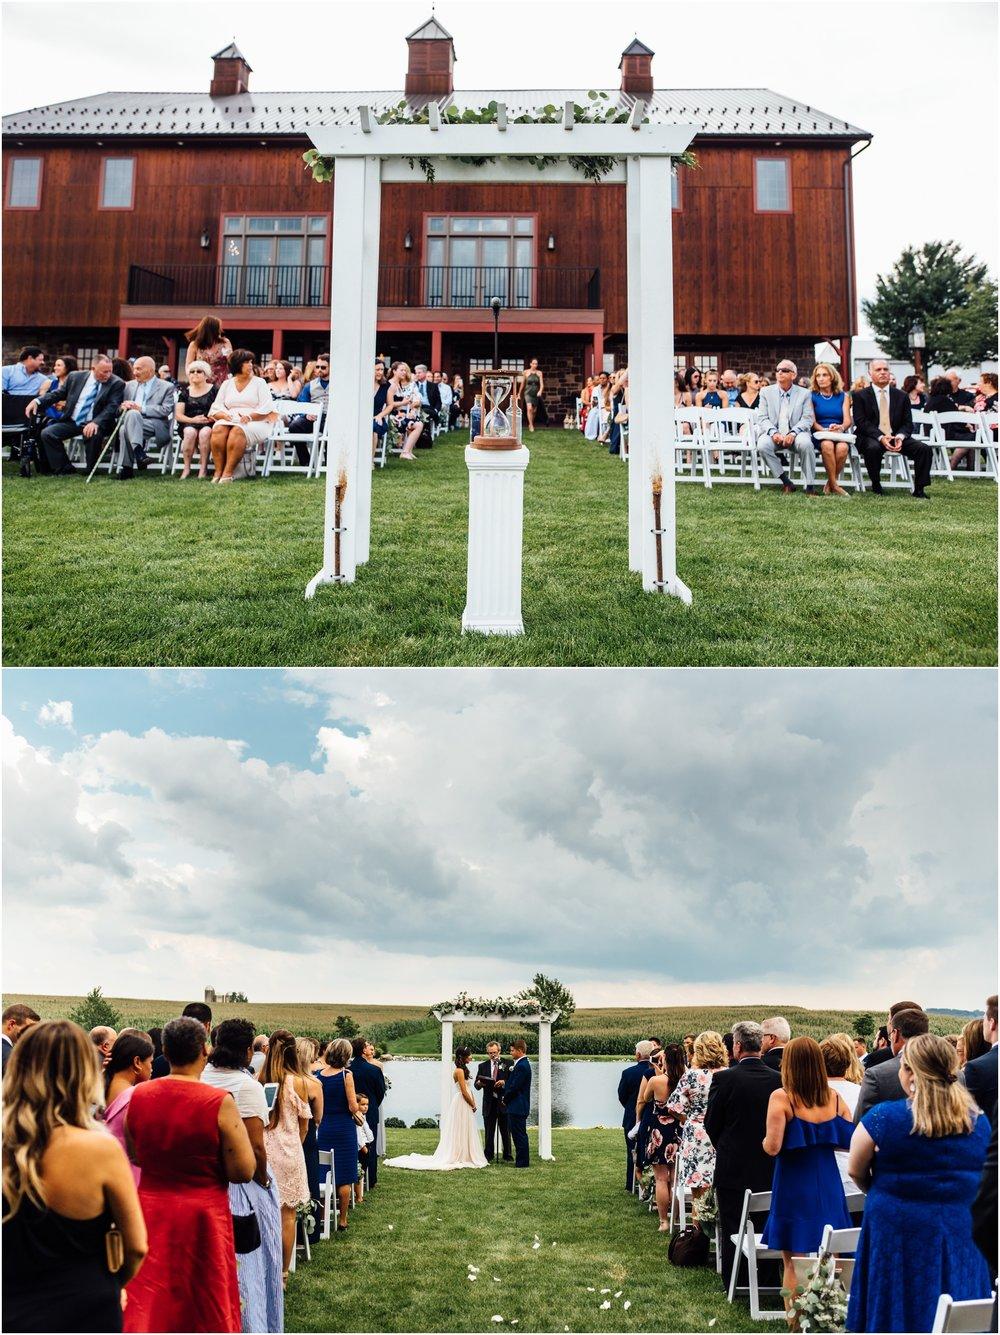 Steph&Bryan_Lancaster_wedding_farm_0516.jpg